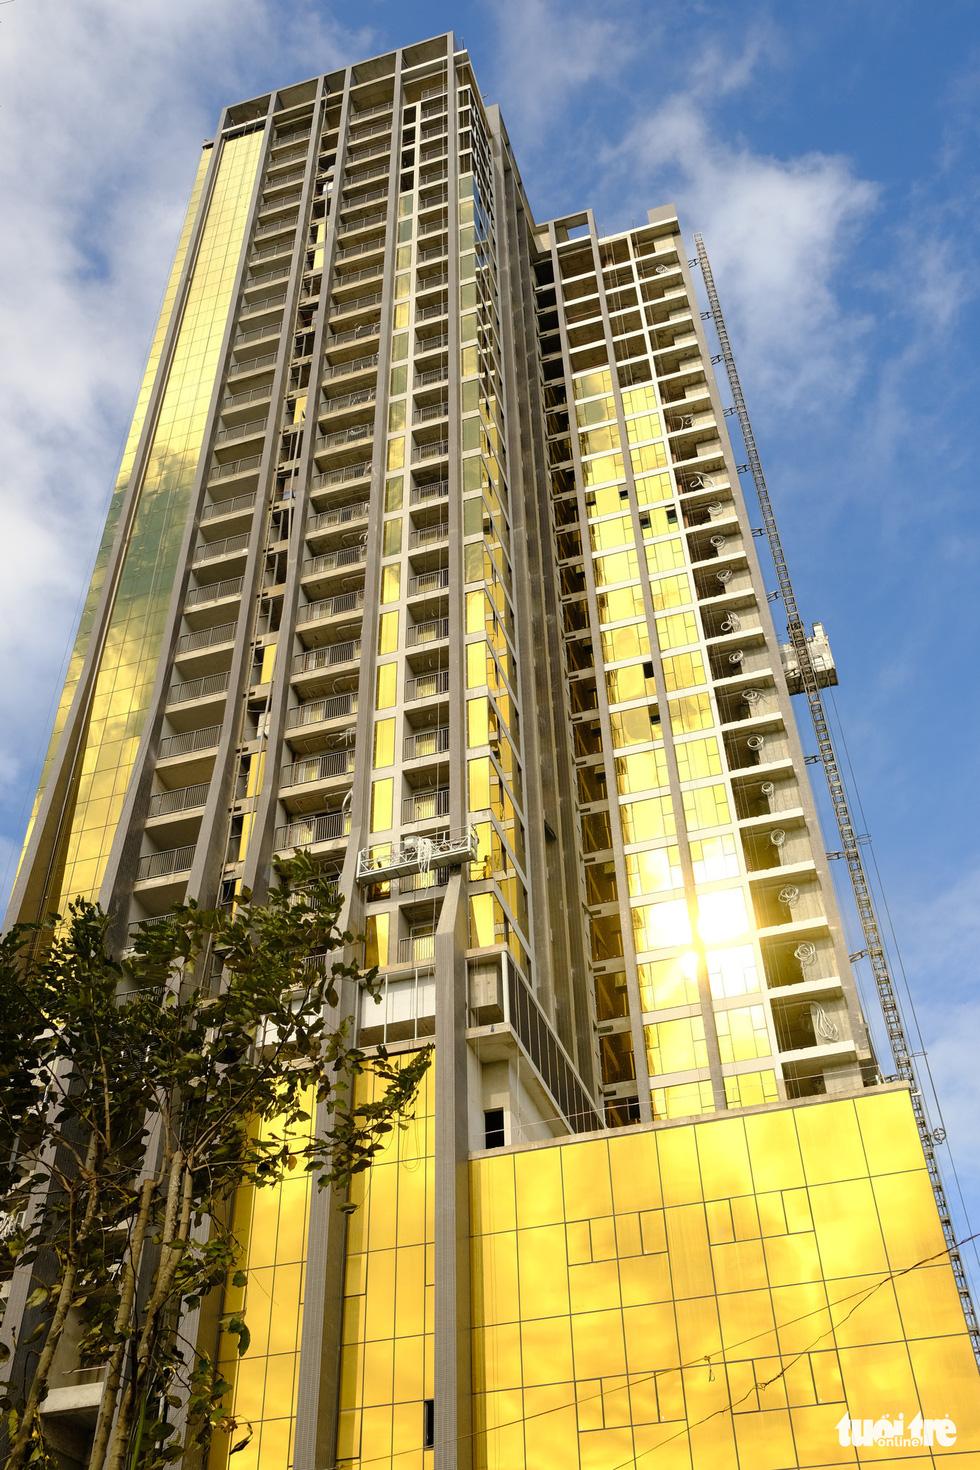 The Risemount Apartment Da Nang tower on Nhu Nguyet Street, Hai Chau District, Da Nang. Photo: Tan Luc / Tuoi Tre